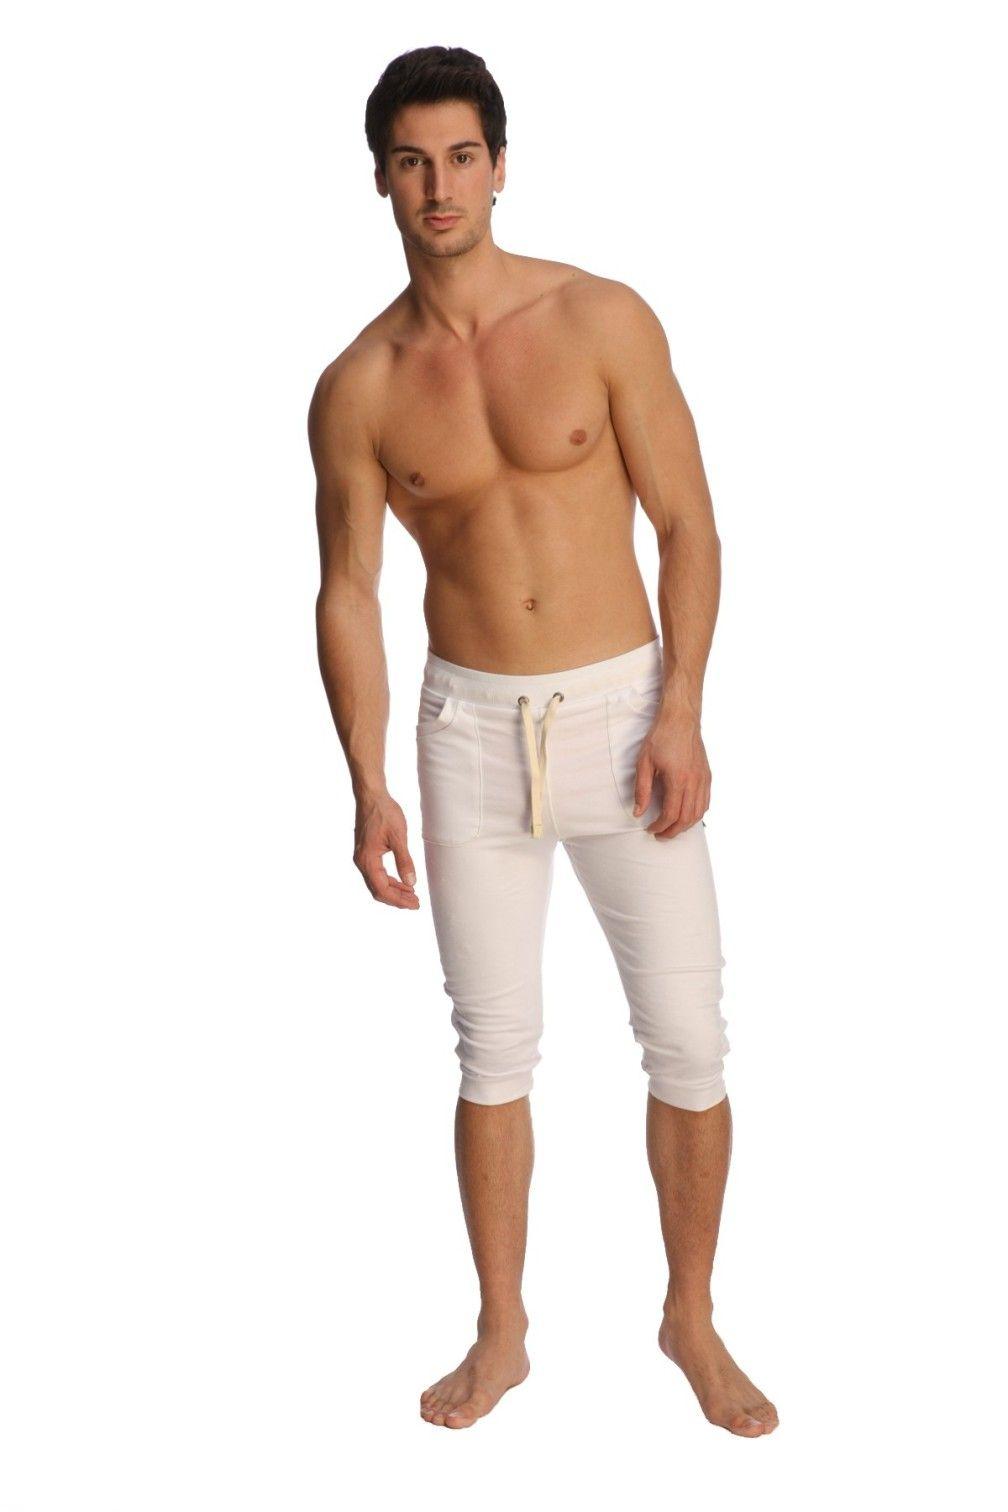 Yoga Pant For Men - Fat Pants